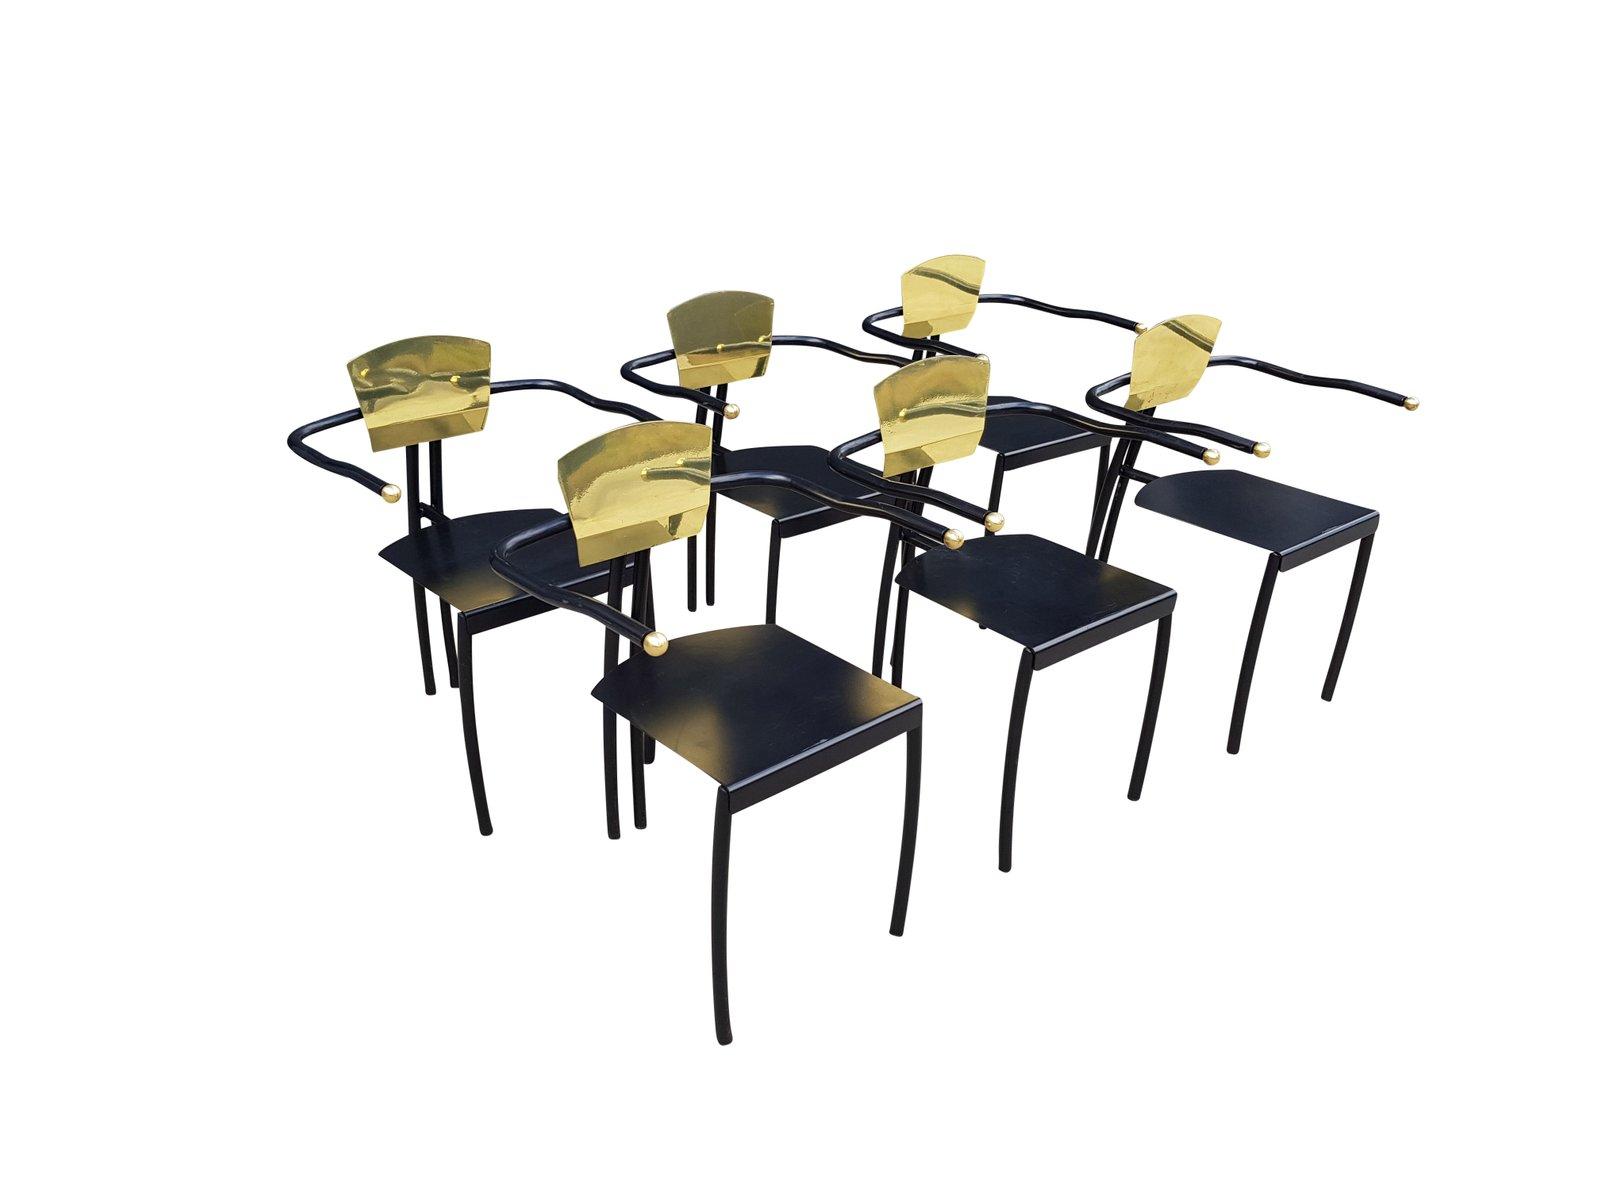 memphis messing schwarz lackierte metall st hle 6er set 1980er bei pamono kaufen. Black Bedroom Furniture Sets. Home Design Ideas